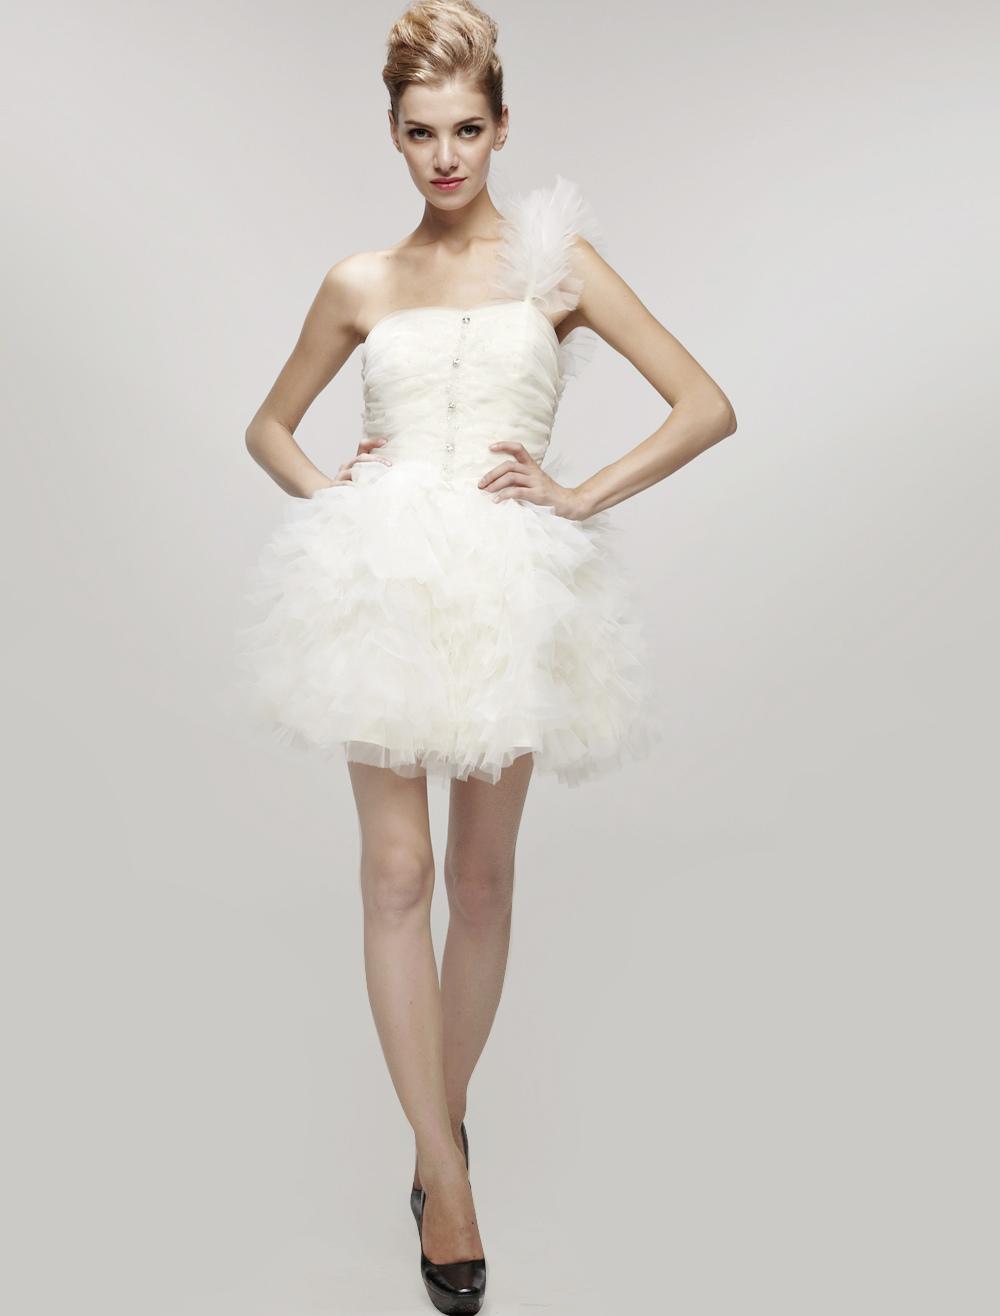 Sexy White Gauze One Shoulder Mini Wedding Dress (Cheap Party Dress) photo